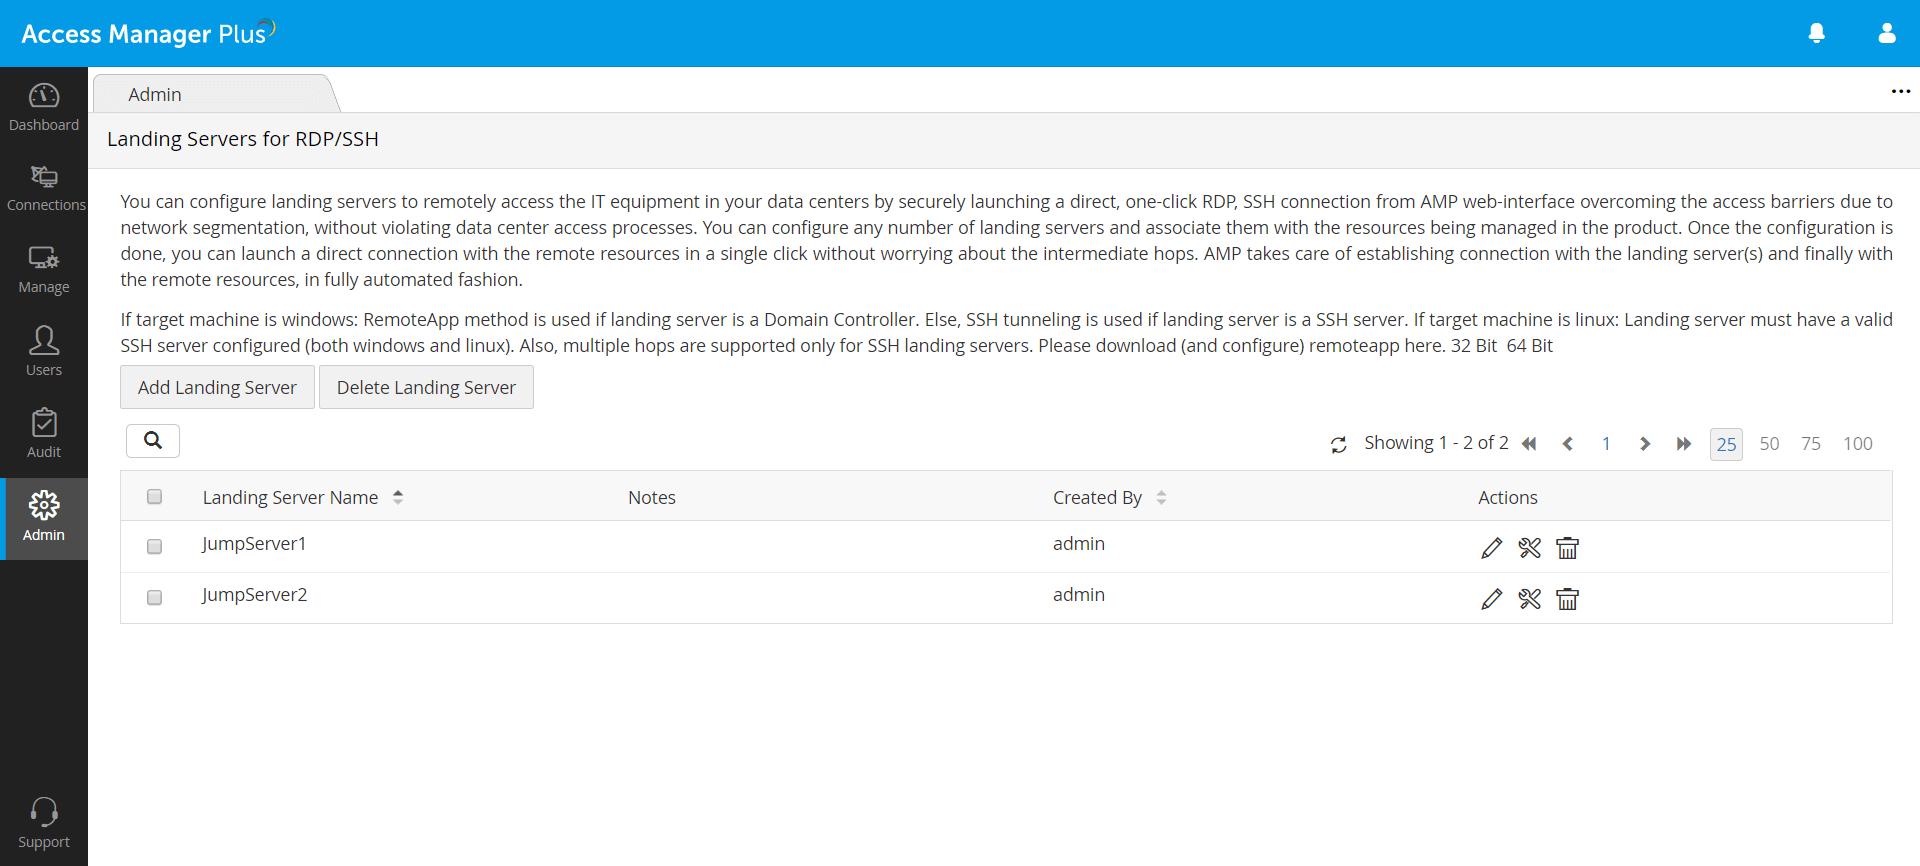 establishing RDP/SSH landing servers Access Manager Plus